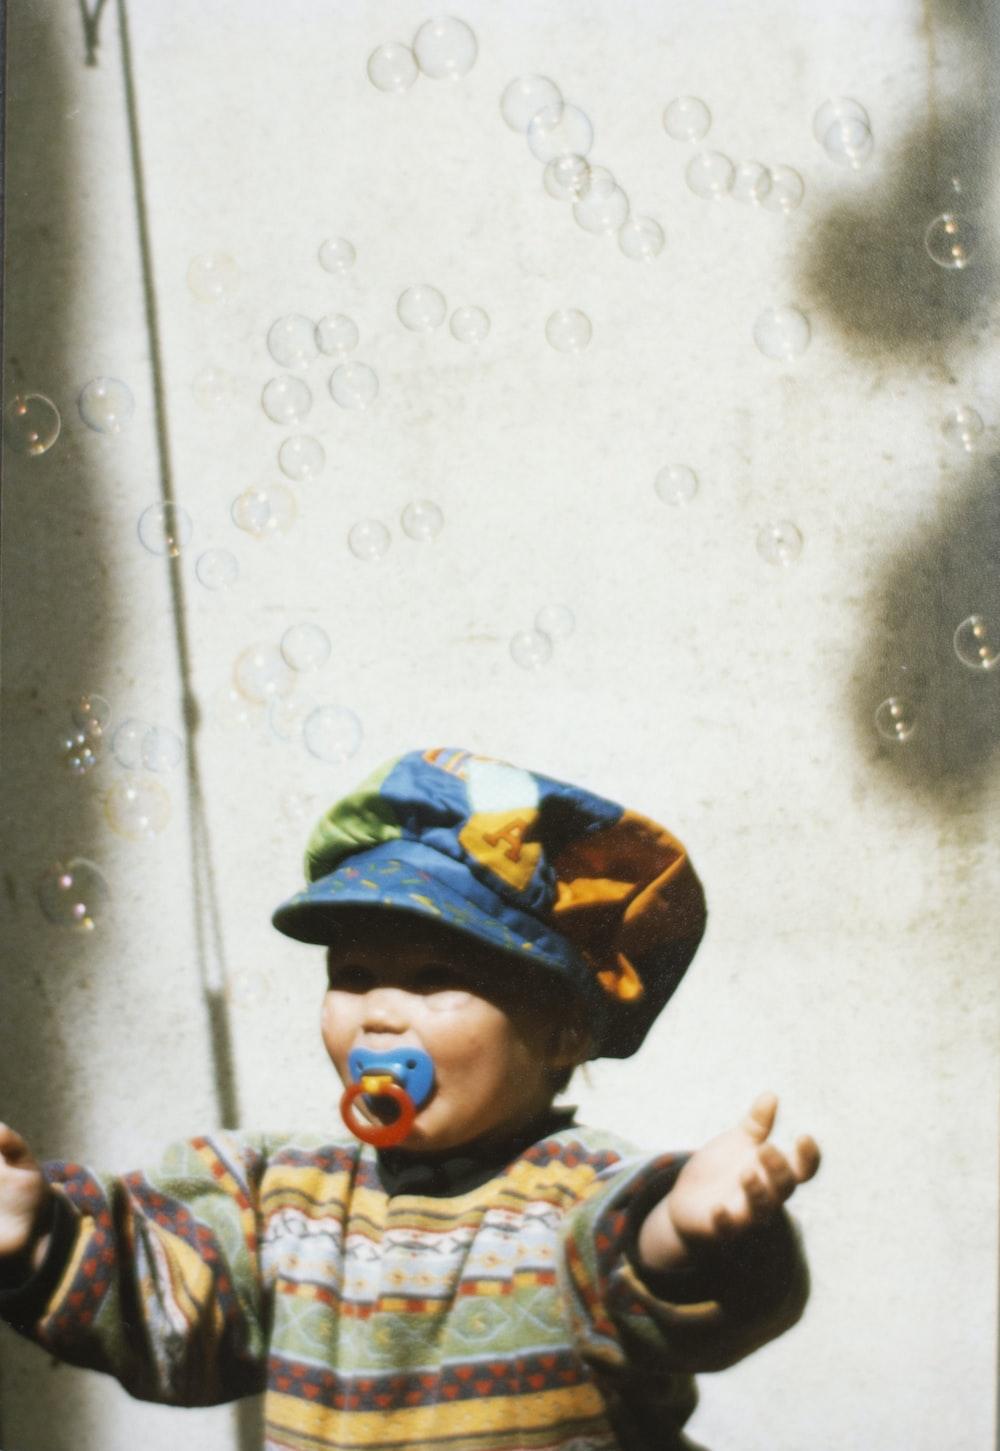 toddler standing near wall